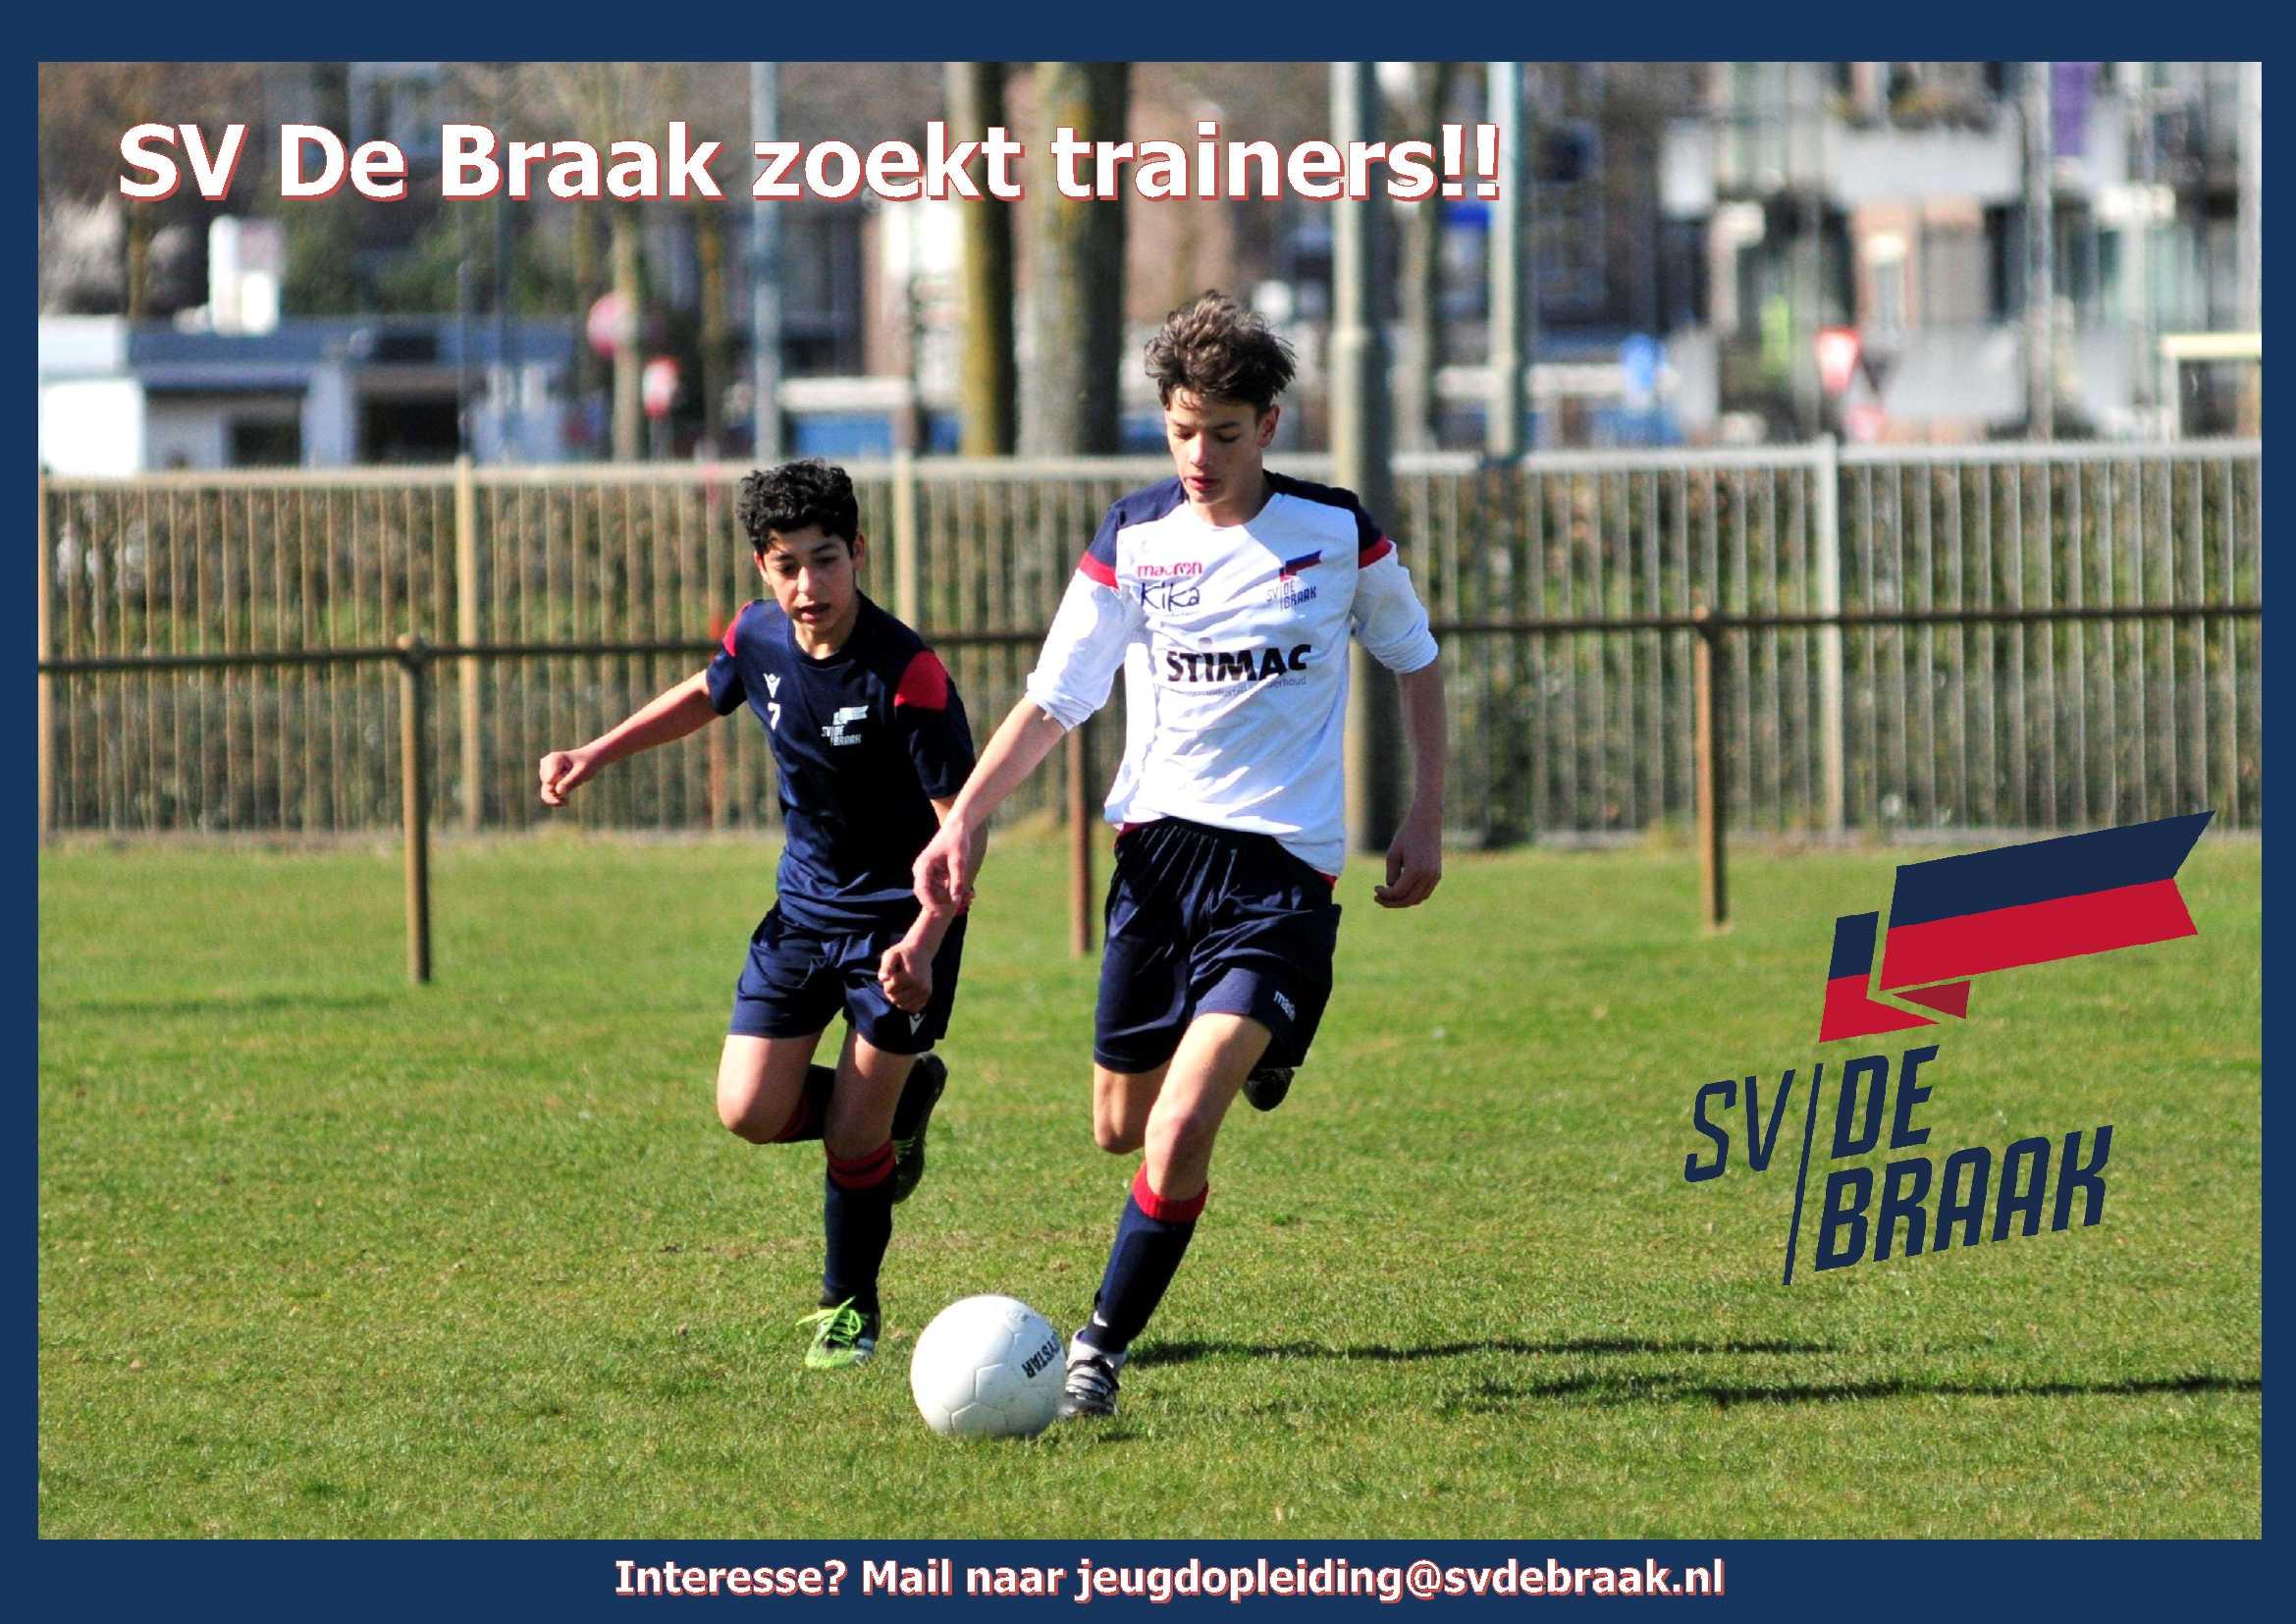 SV De Braak zoekt jeugdtrainers!